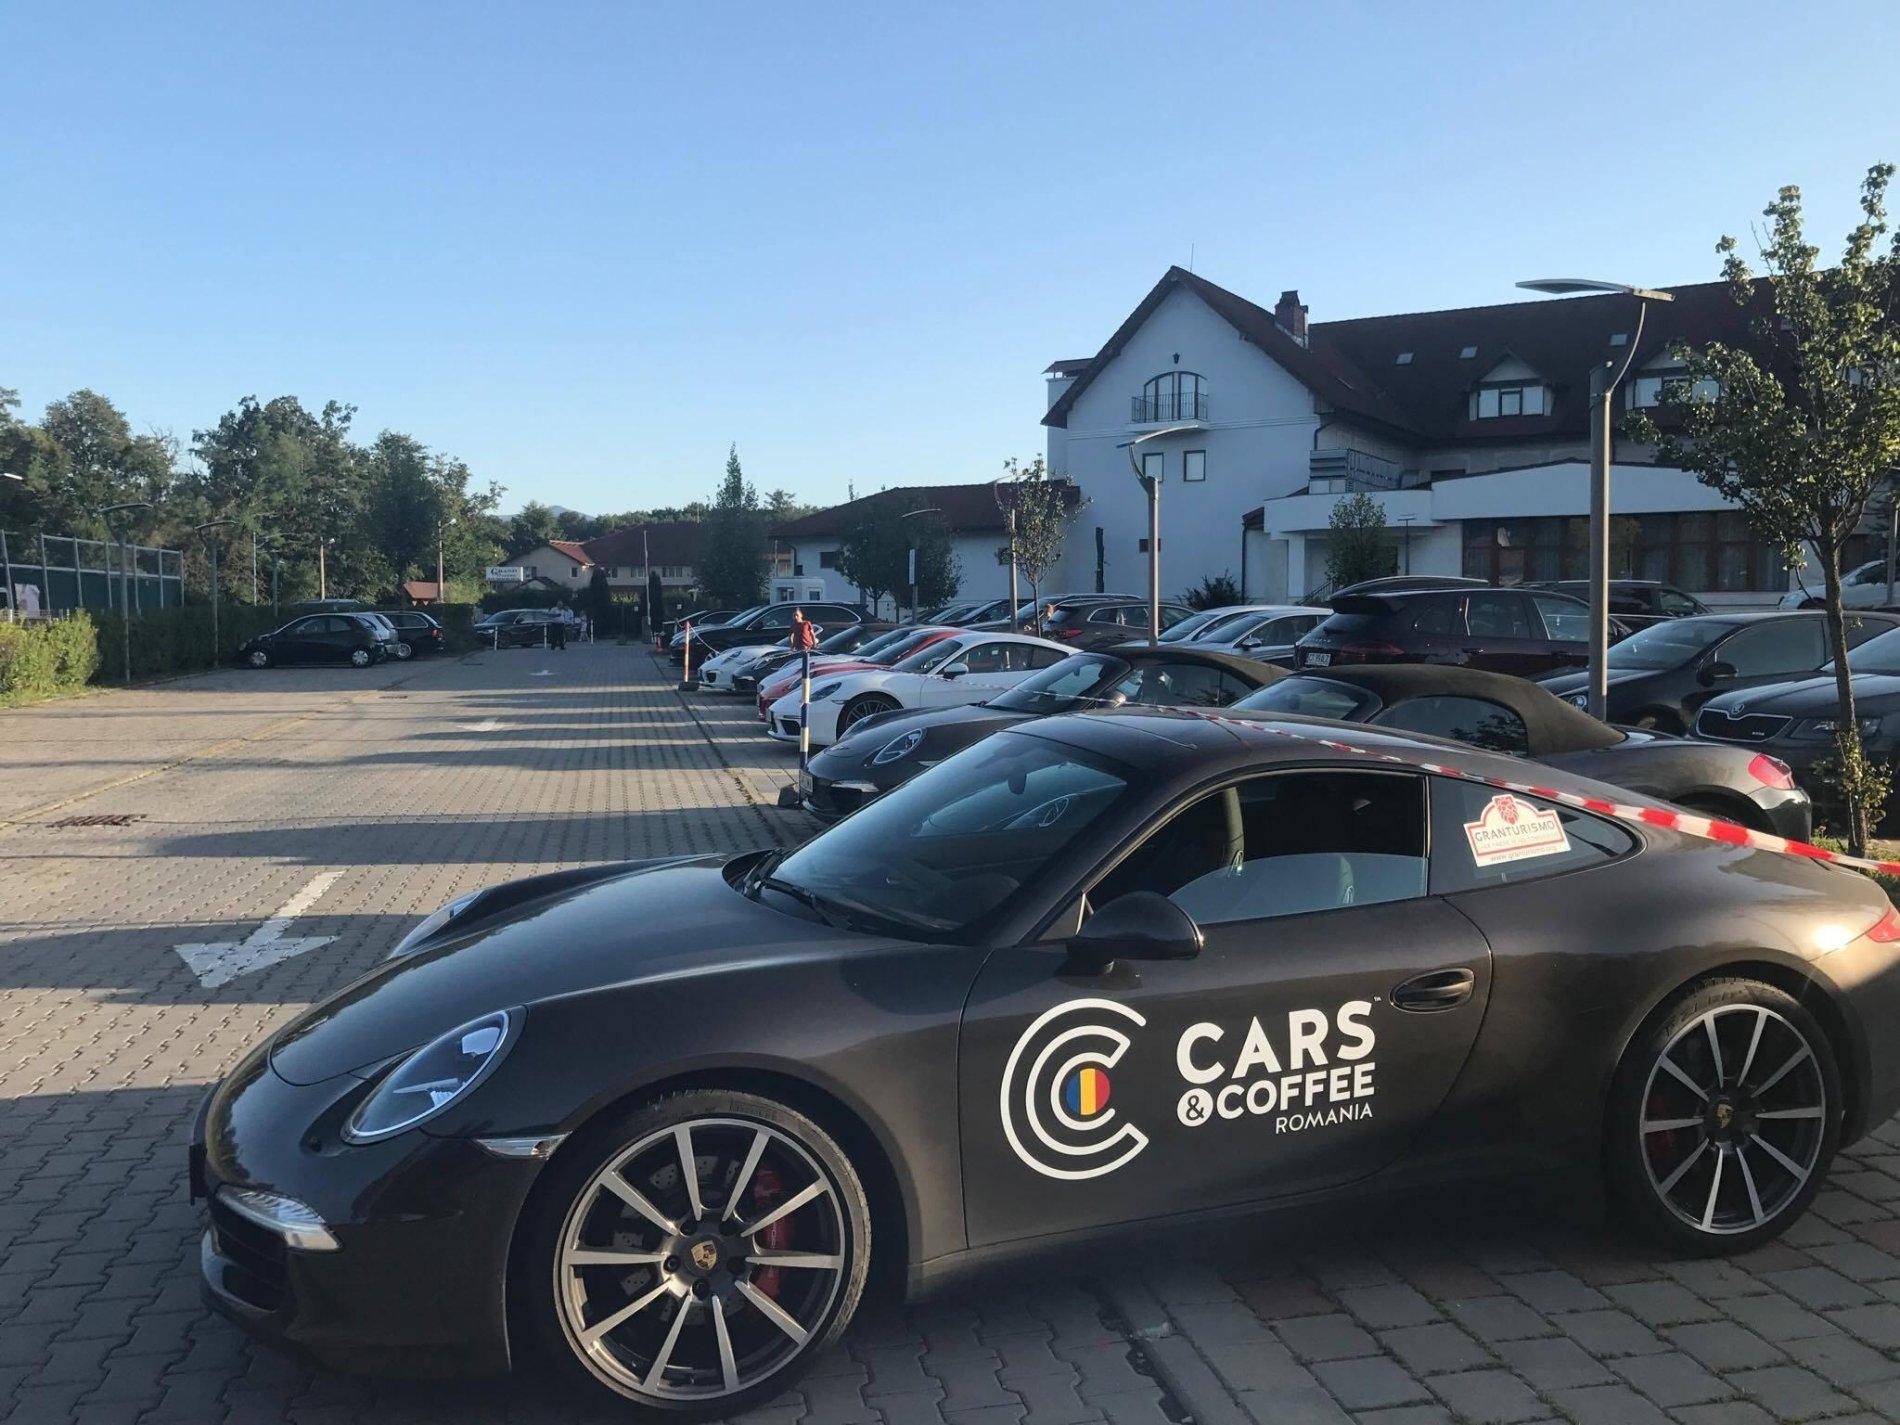 Cars and Coffee - Cars and Coffee